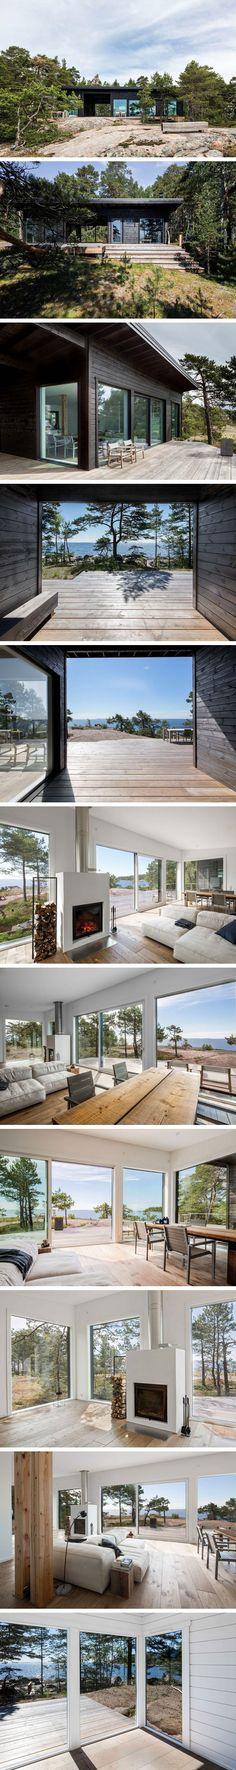 Маленький дом на острове от Pluspuu  #tinyhomesdigest #tinyhouse #ecohouse